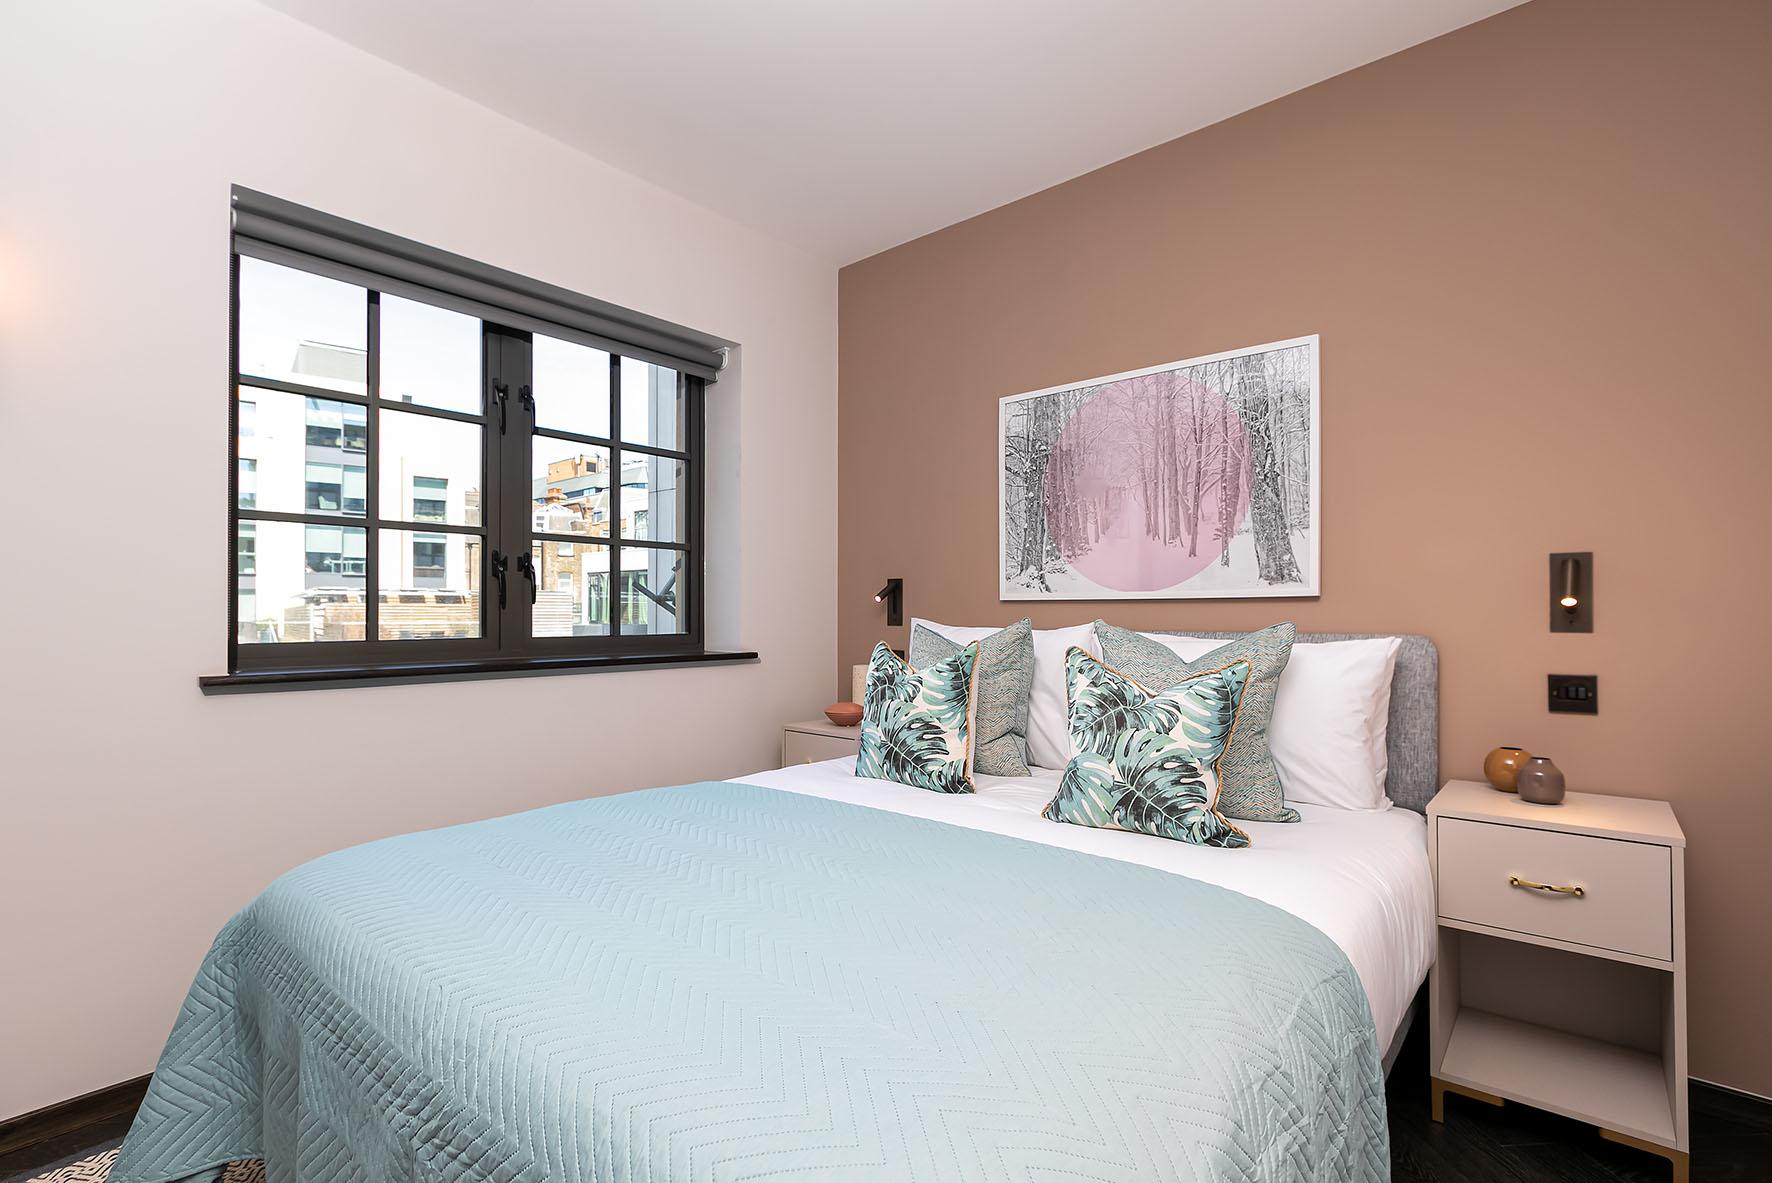 Lovelydays luxury service apartment rental - London - Soho - Oxford Street V - Lovelysuite - 1 bedrooms - 1 bathrooms - Queen bed - a1cbbdf44eed - Lovelydays